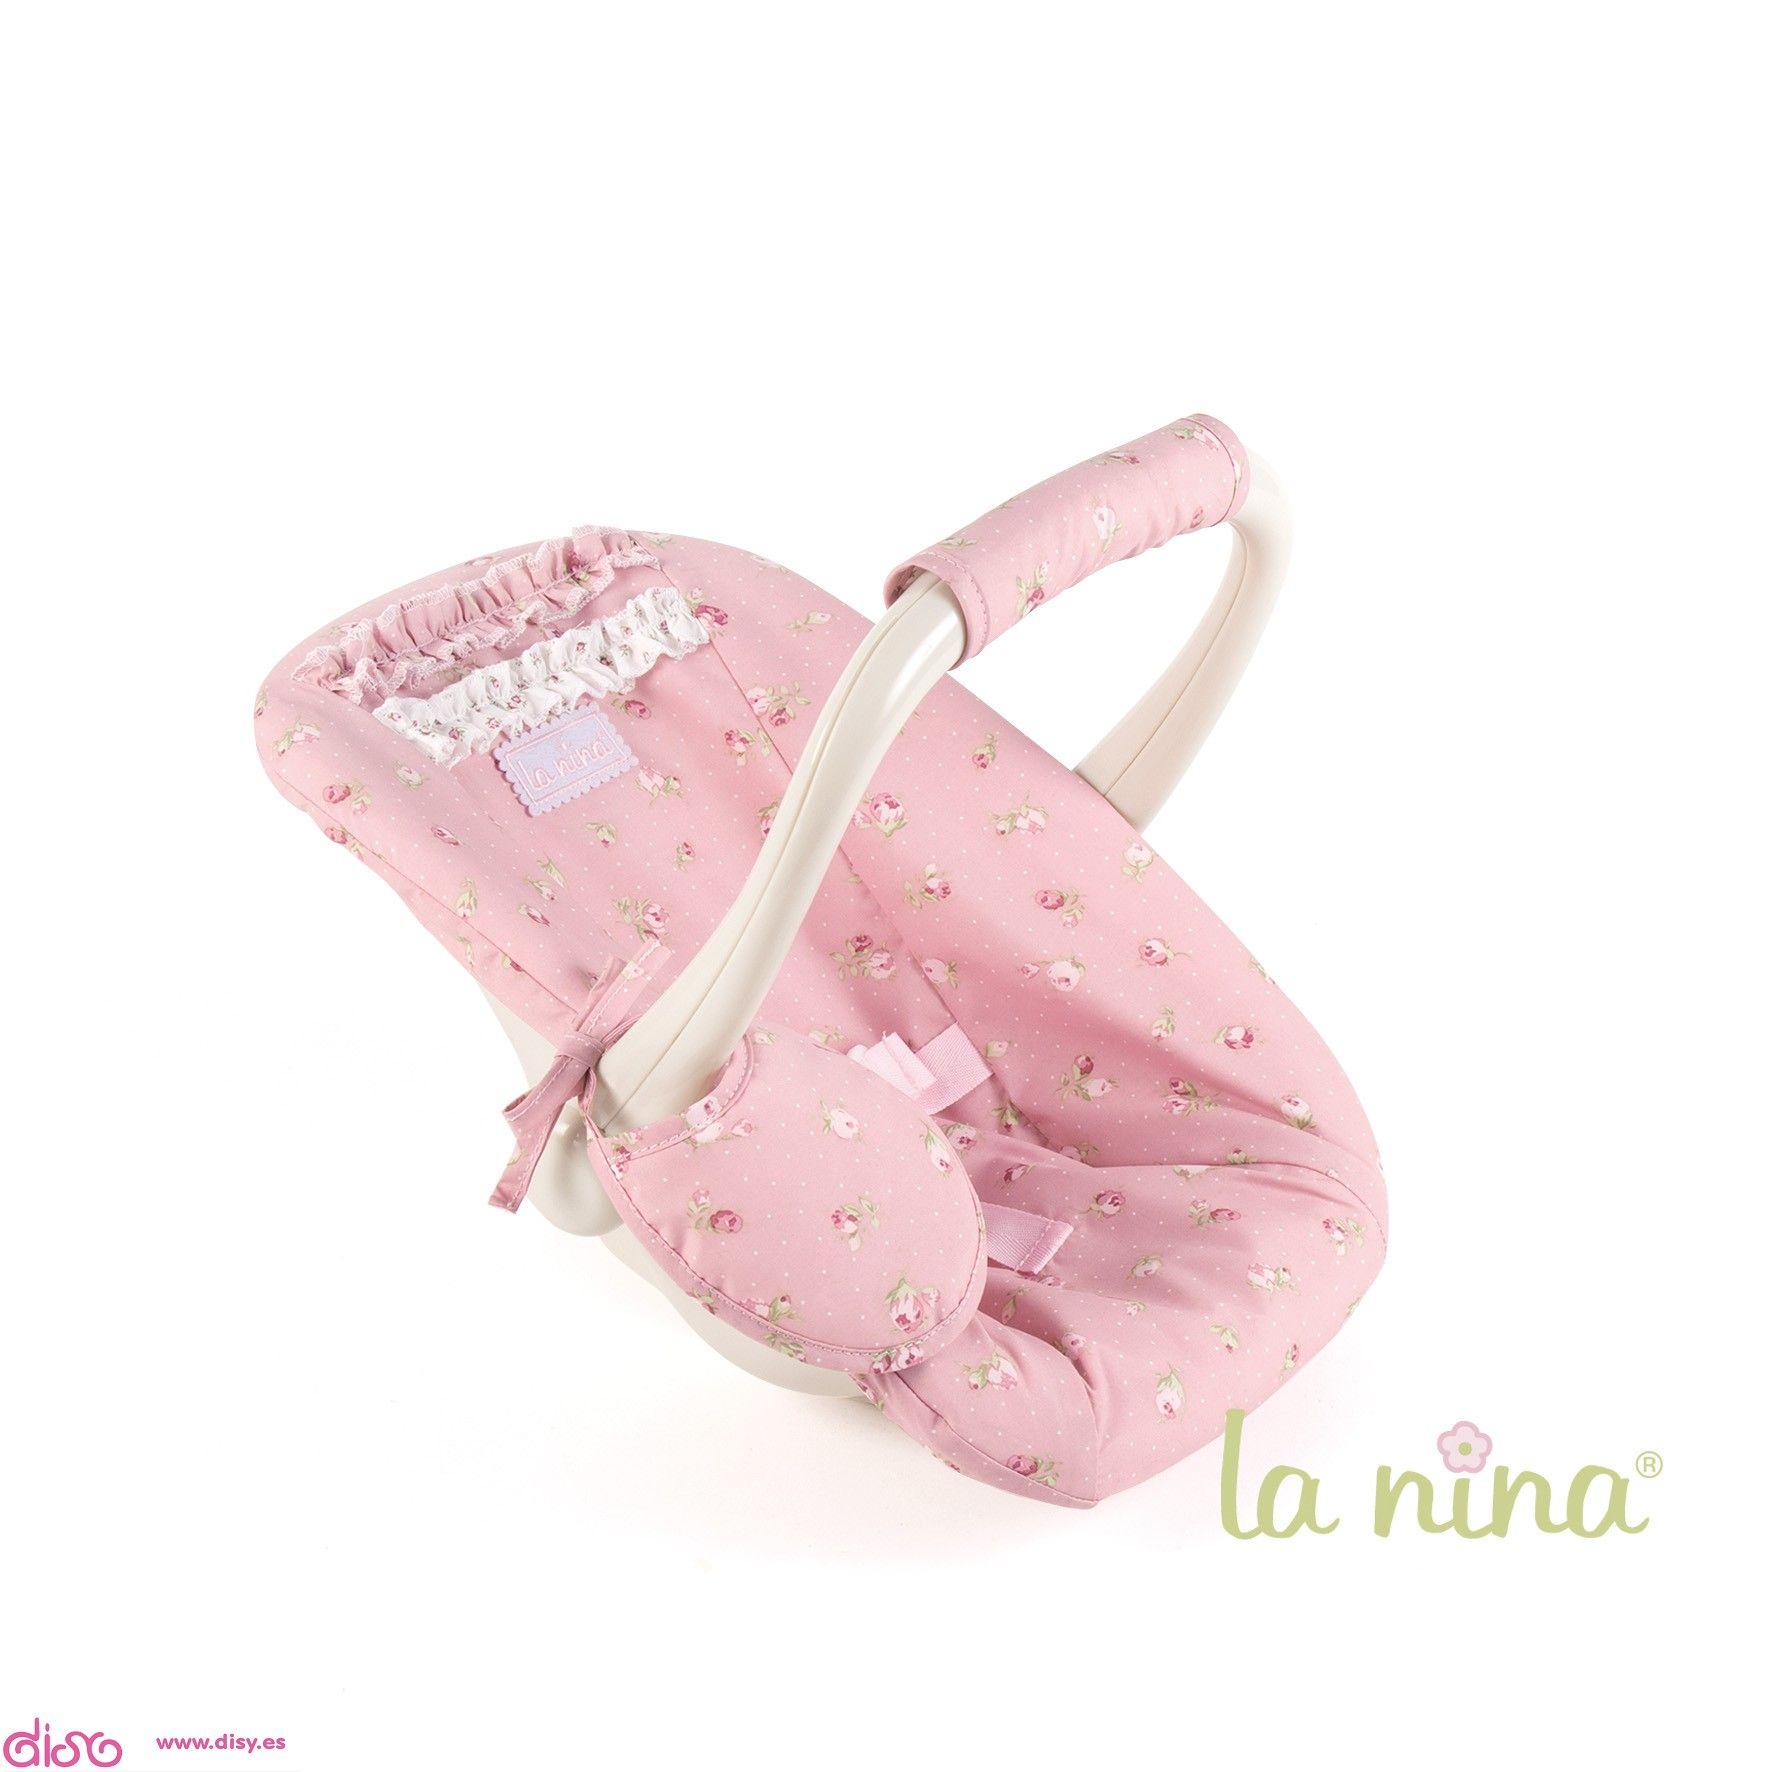 accesoriosmuñecas Maxi Cosi Lily - Accesorios para muñecas La nina ...